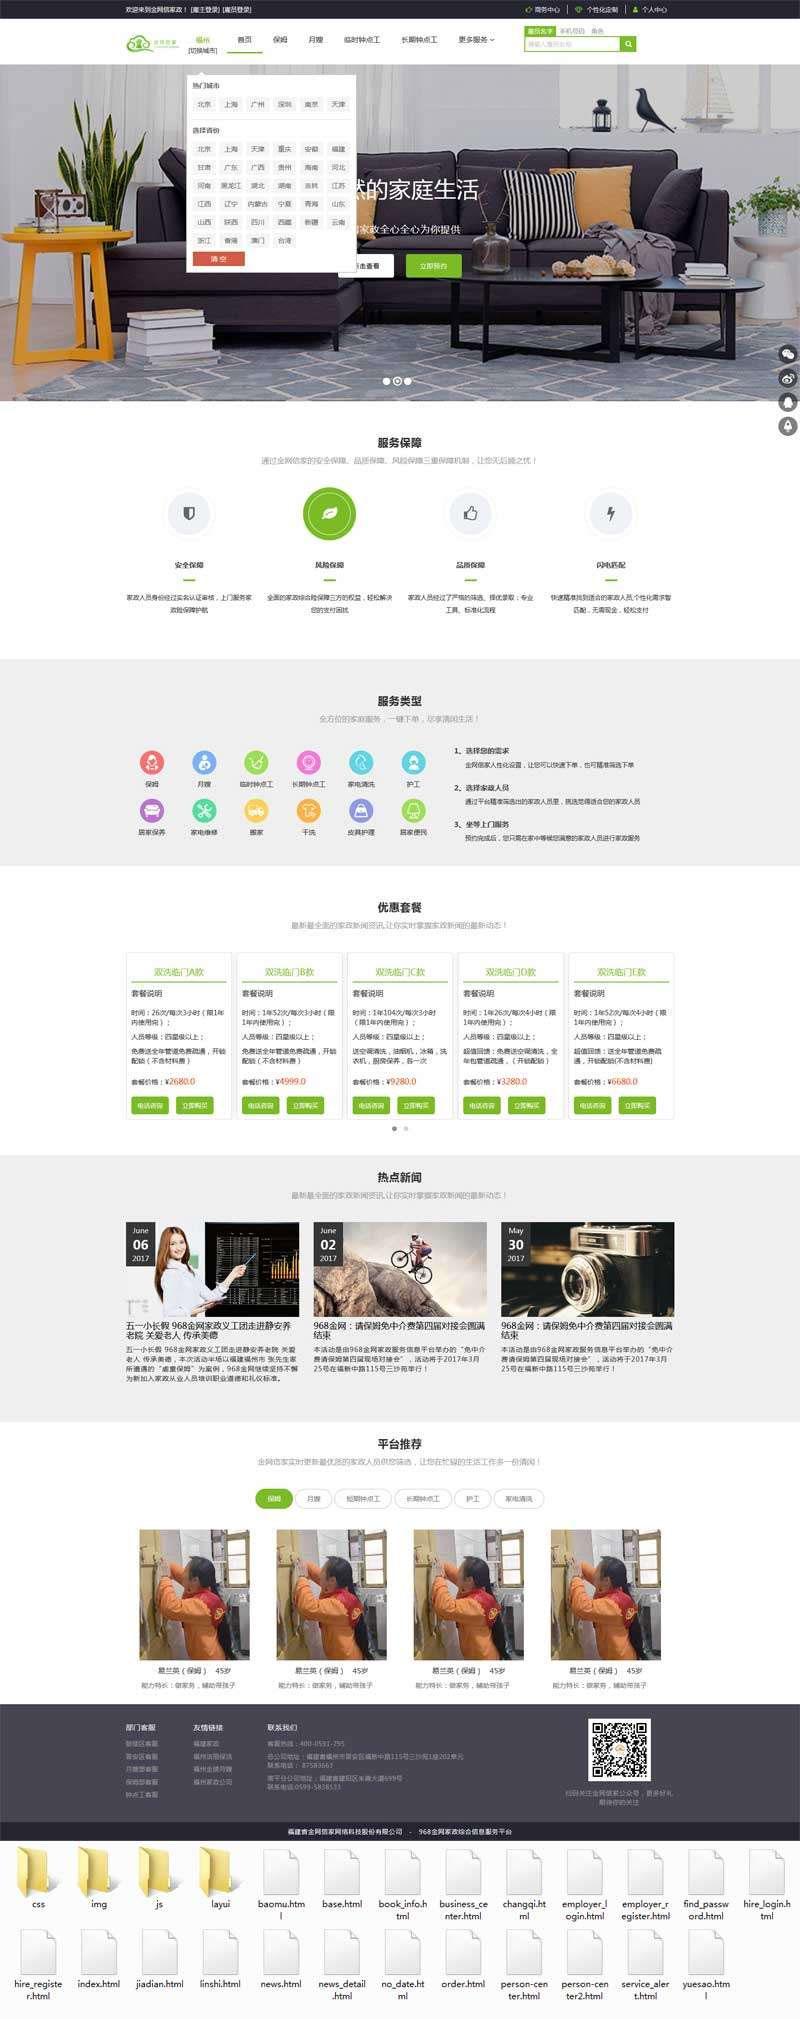 html5绿色响应式家政服务保姆月嫂雇佣平台网站模板